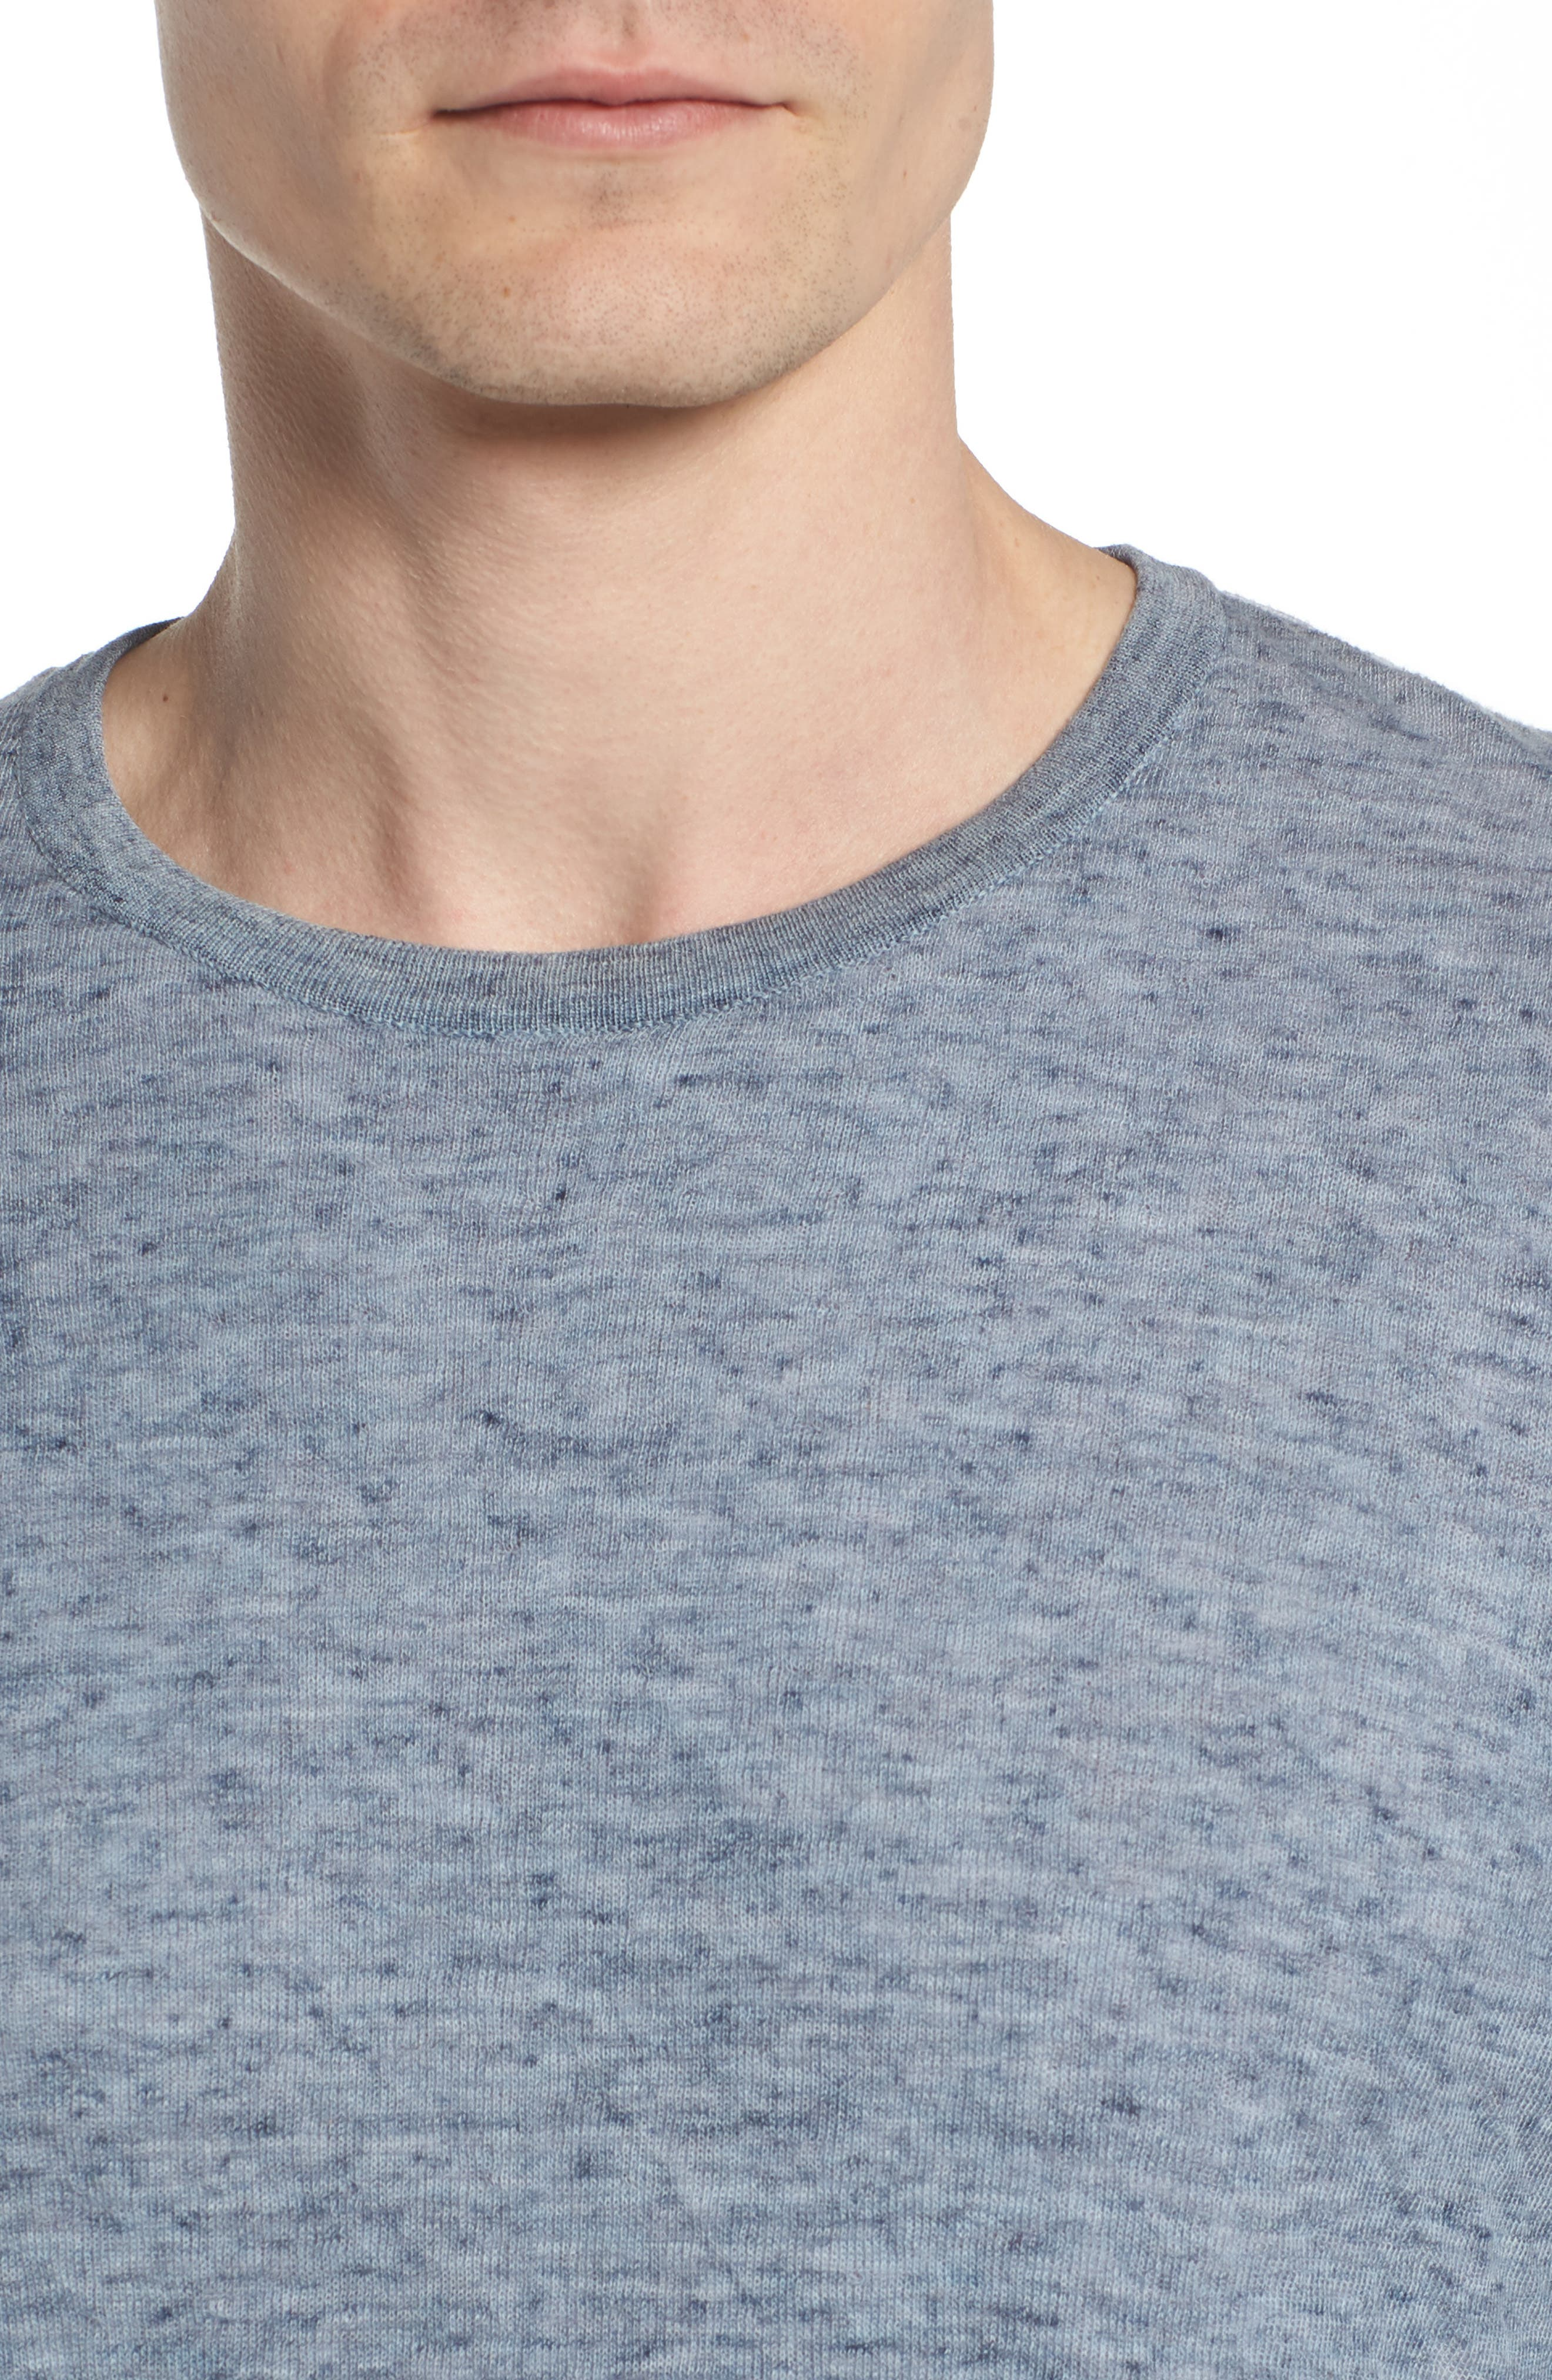 Tripp Regular Fit Crewneck Shirt,                             Alternate thumbnail 4, color,                             LIGHT BLUE